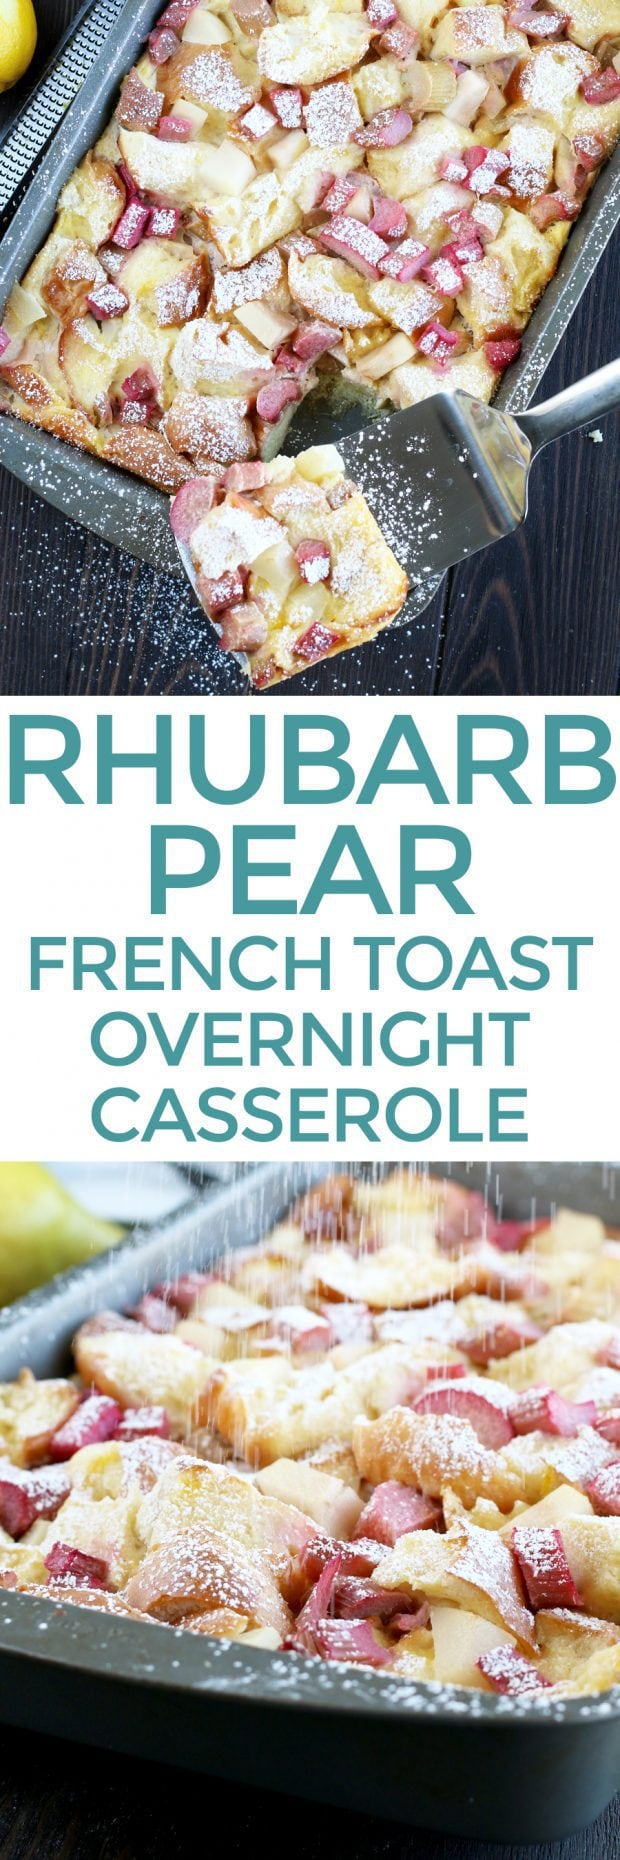 Rhubarb Pear French Toast Overnight Casserole